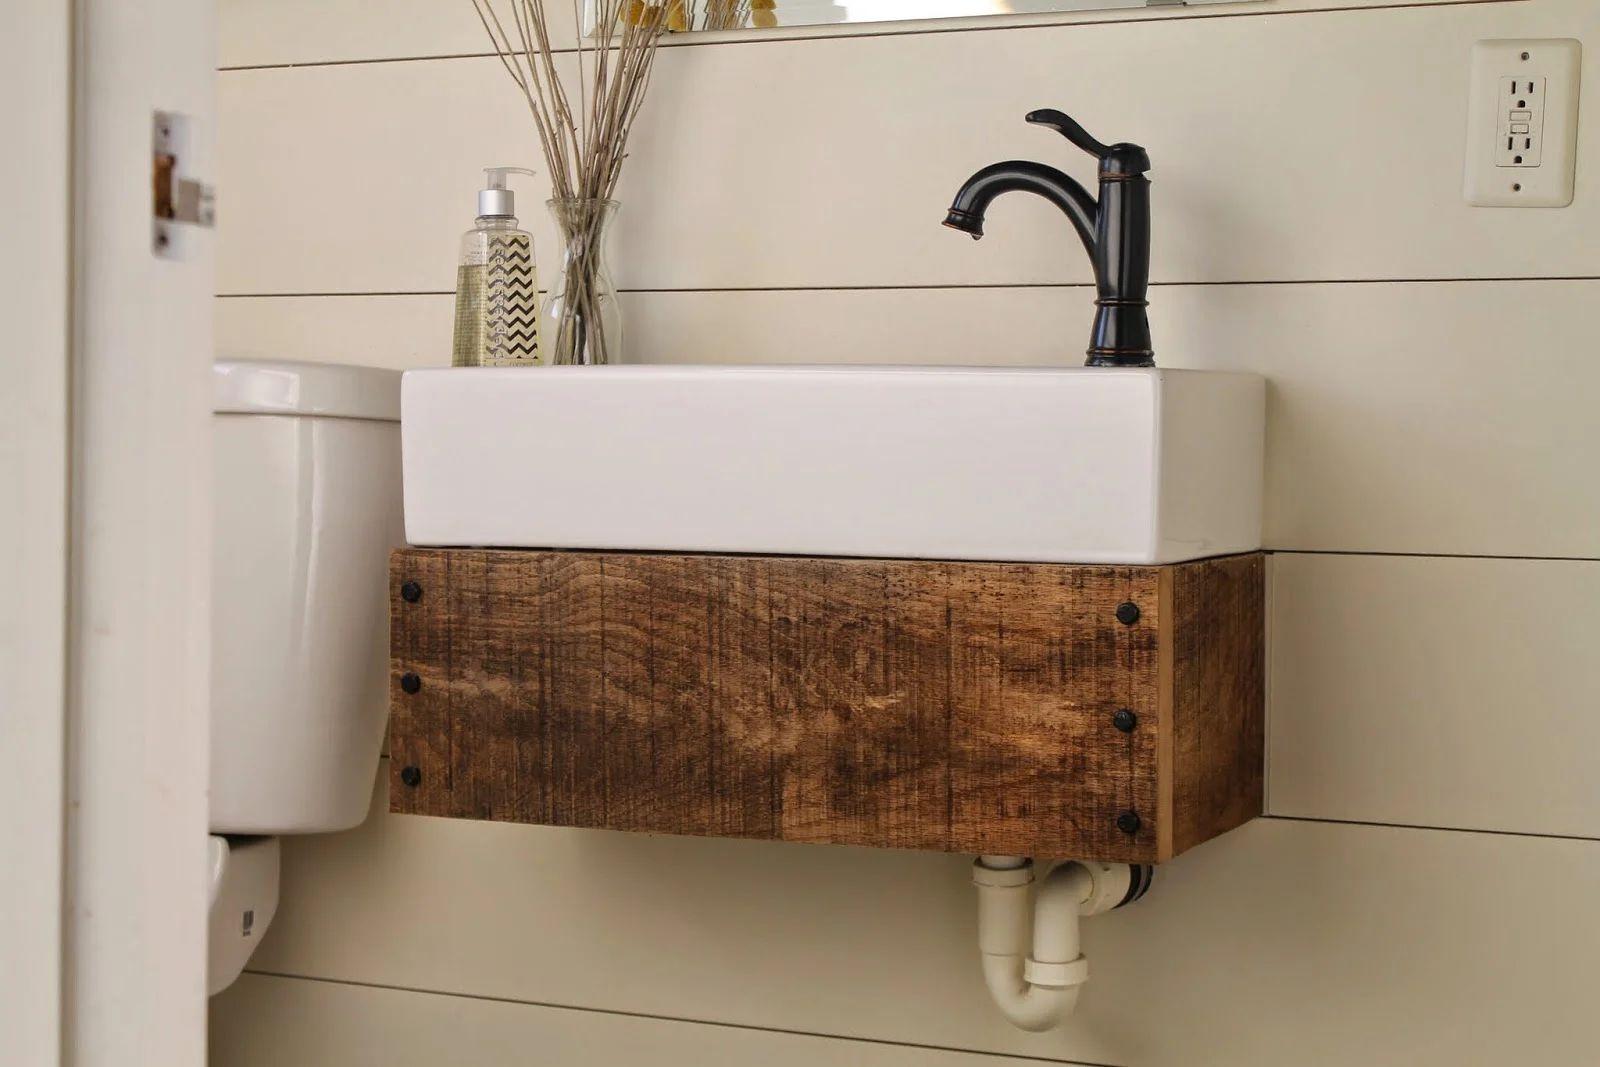 Diy floating reclaimed wood vanity with ikea sink girl meets carpenter featured on remodelaholic